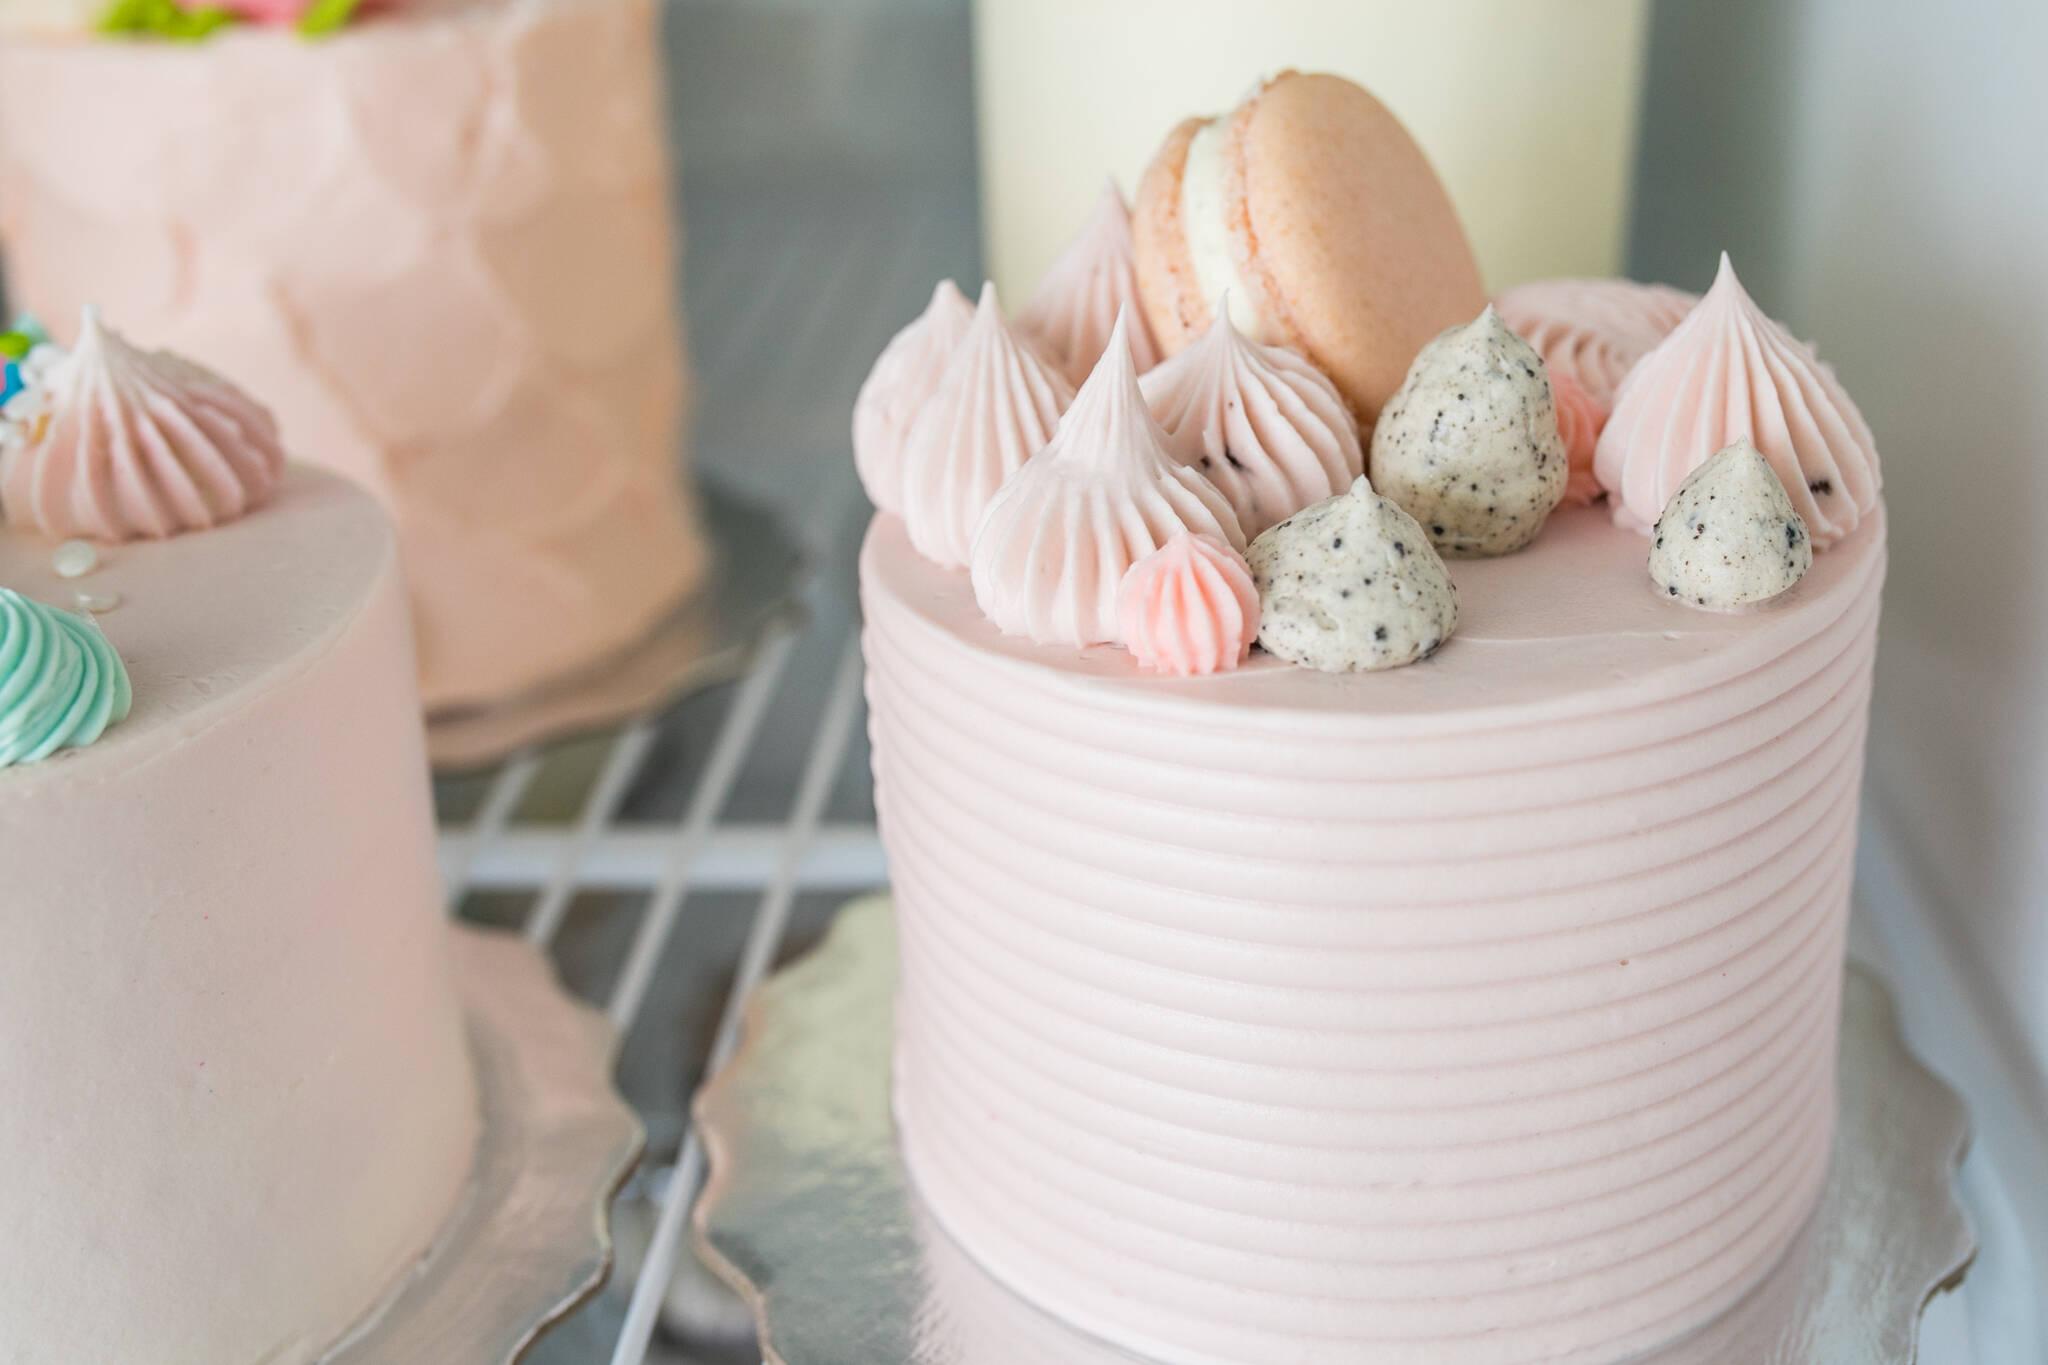 cake delivery toronto